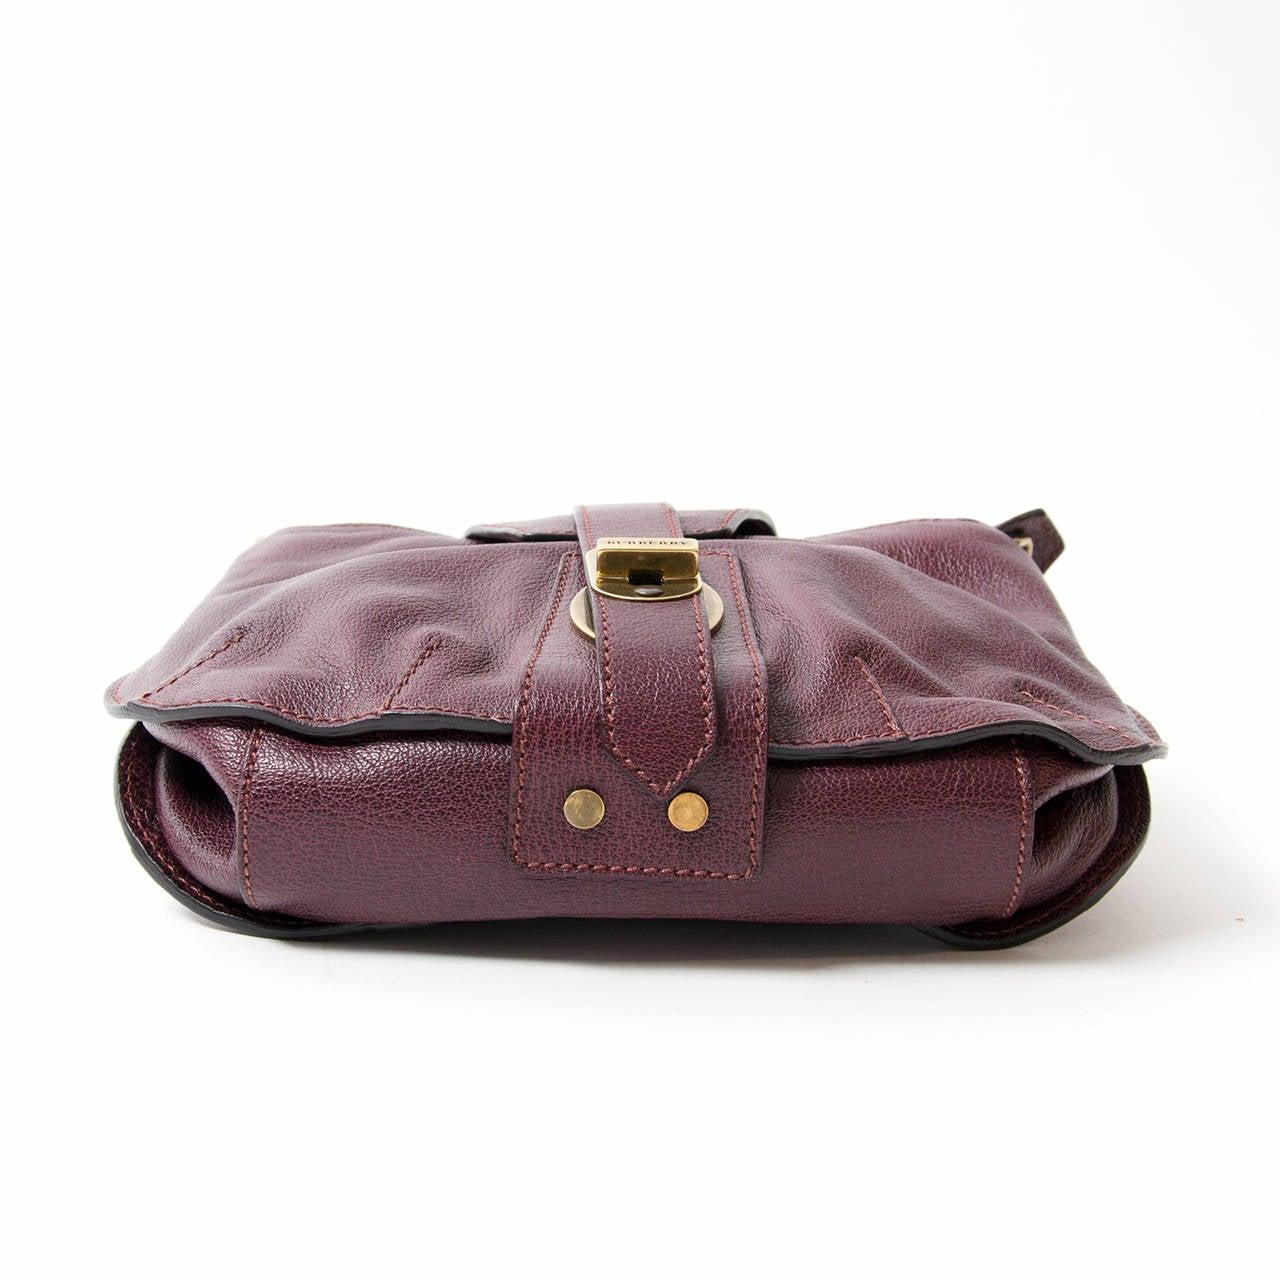 Burberry Bag Purple